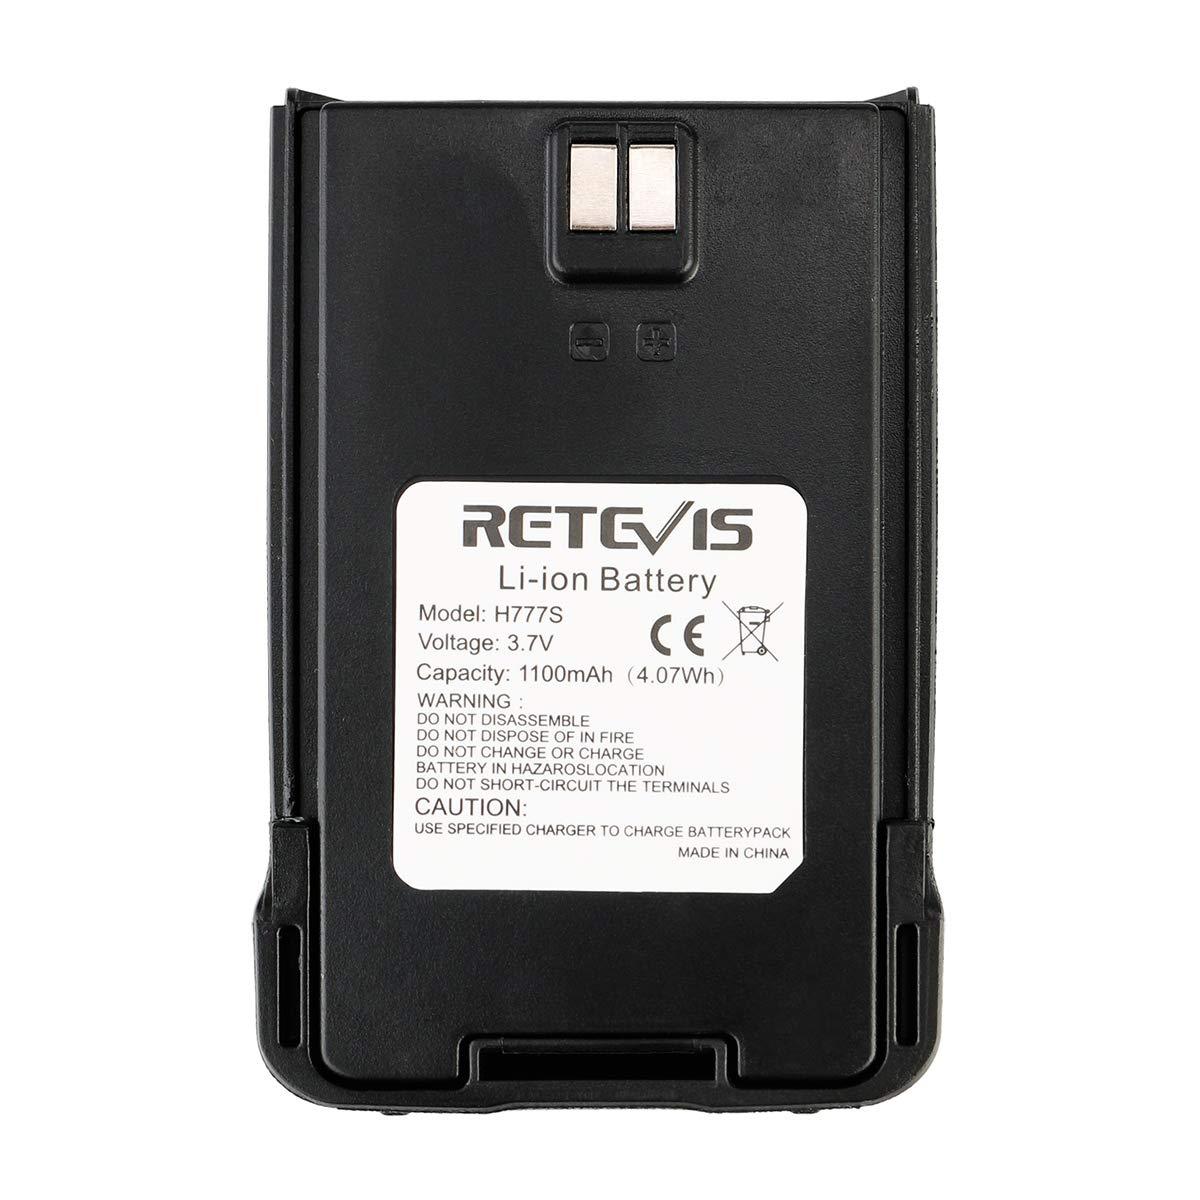 Retevis H-777S Two Way Radios Battery Rechargeable 3.7V 1100mAh Replacement 2 Way Radios Battery for Retevis H-777S RT24 Walkie Talkies (1 Pack)